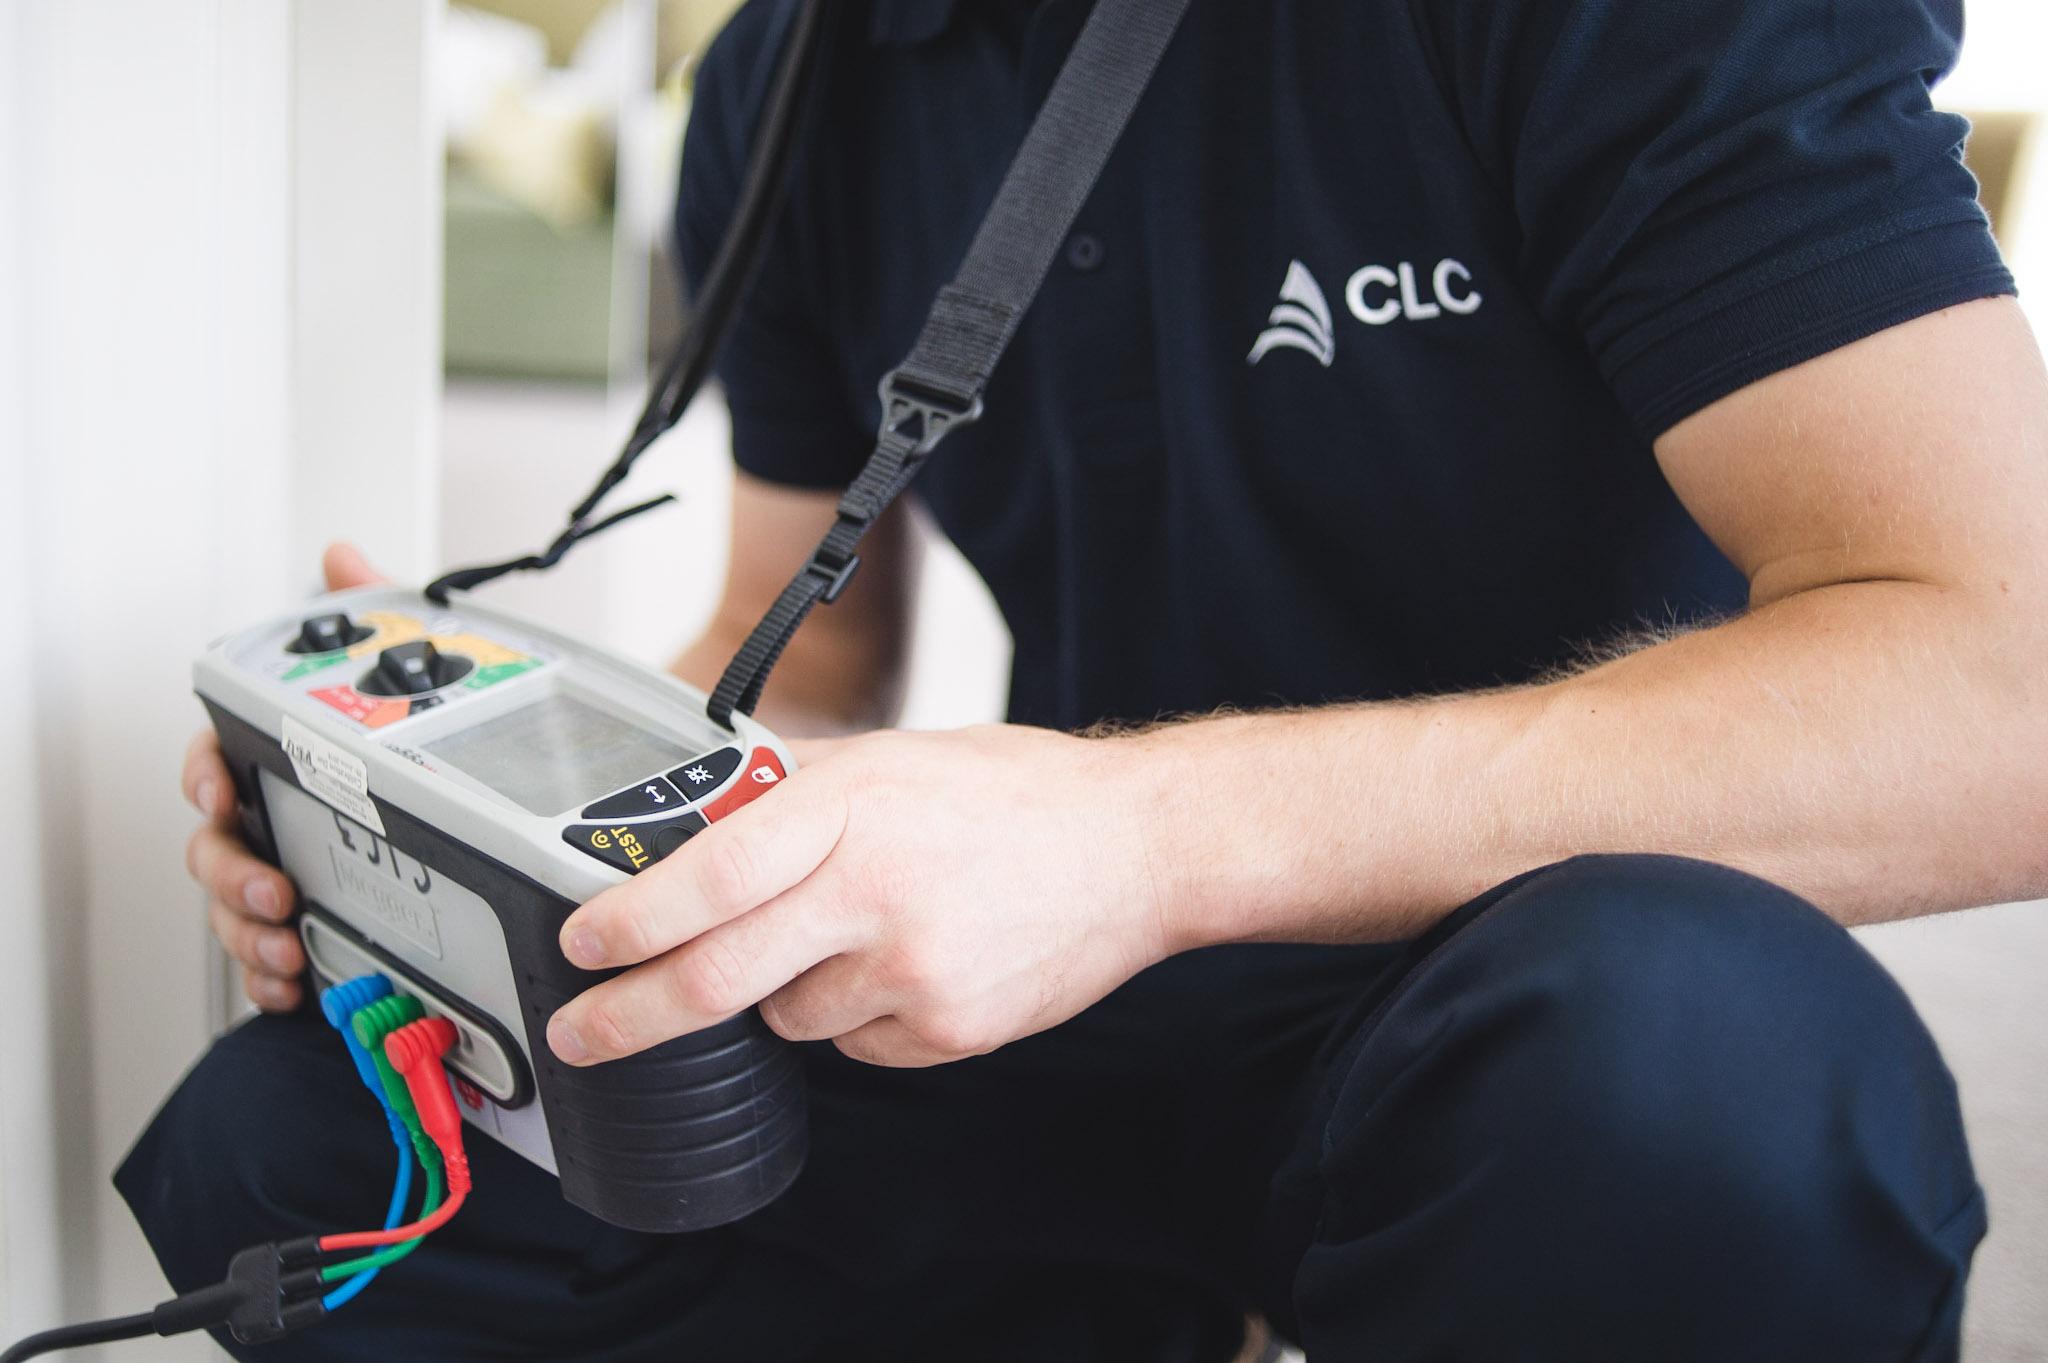 CLC worker testing electrics